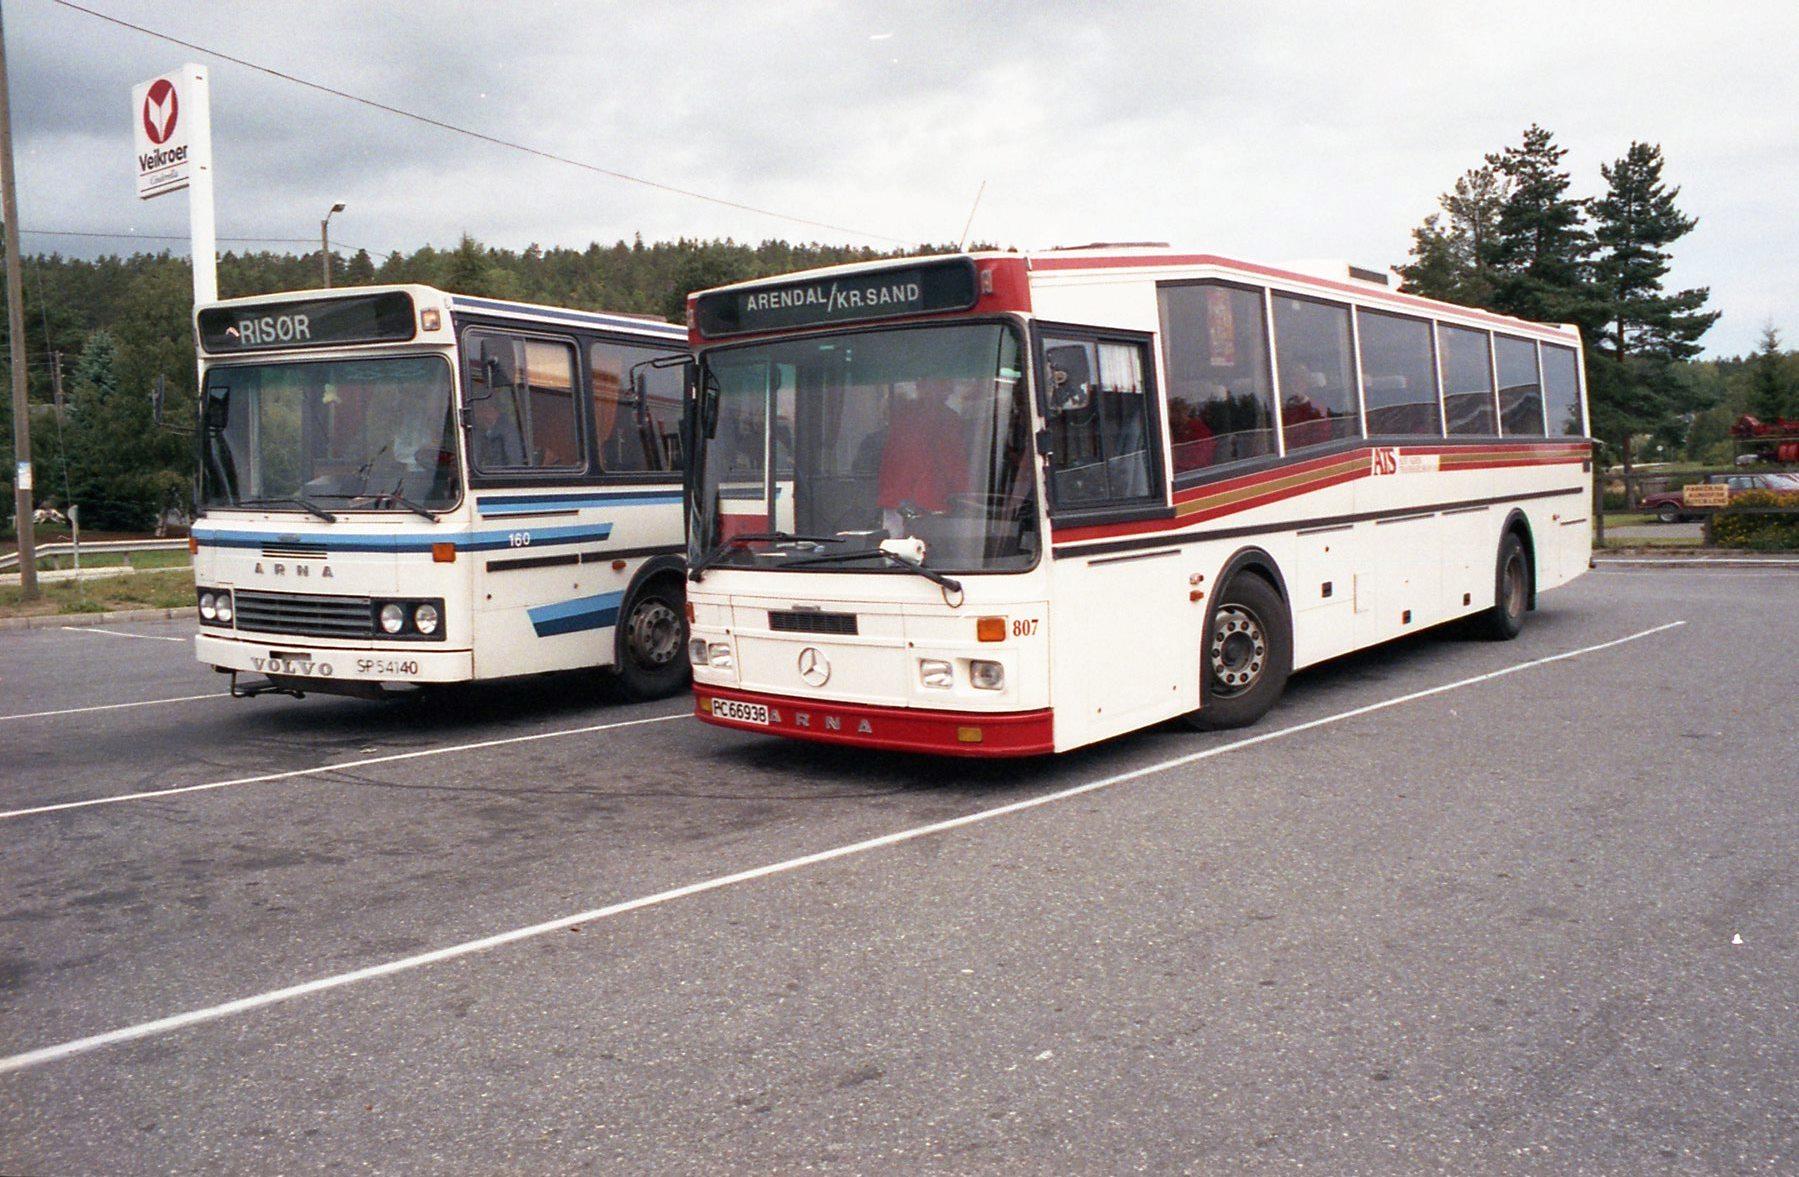 risør arendal buss